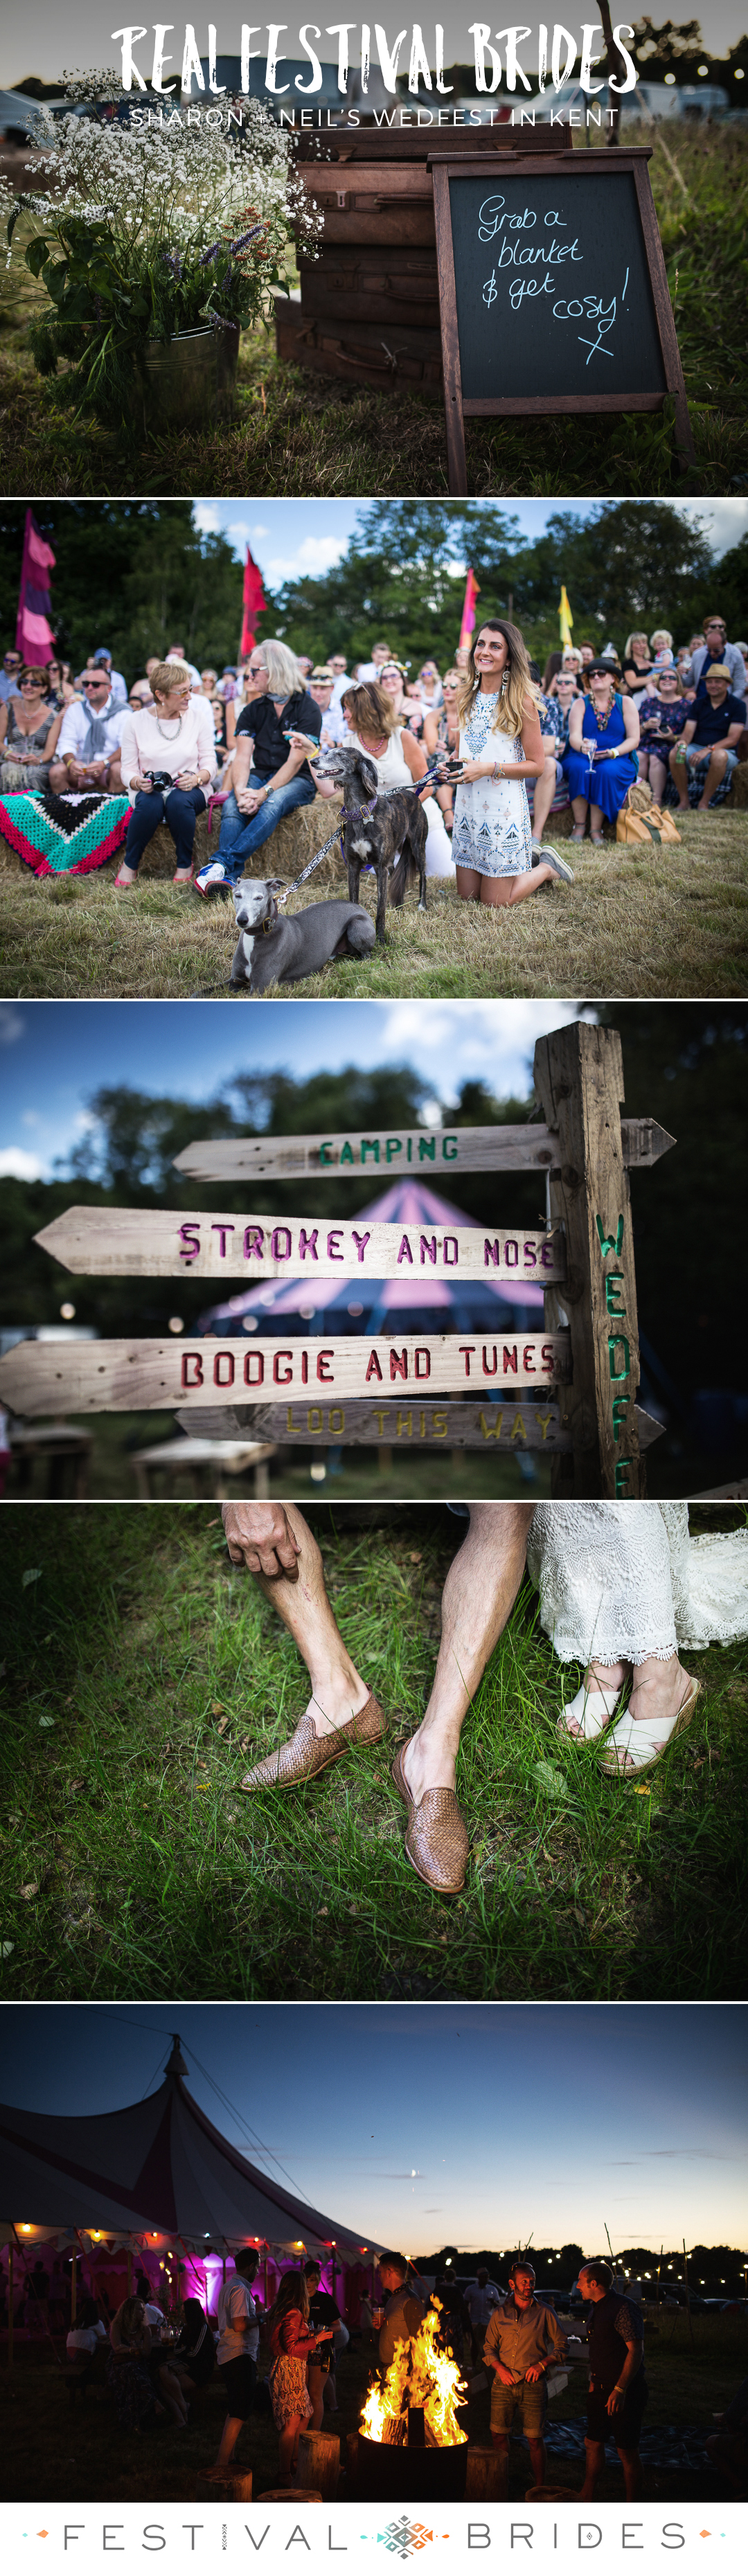 FESTIVAL BRIDES | Sharon + Neil's Wedfest Extravaganza in a Field in Kent | #outdoorwedding #festivalwedding #bohobride